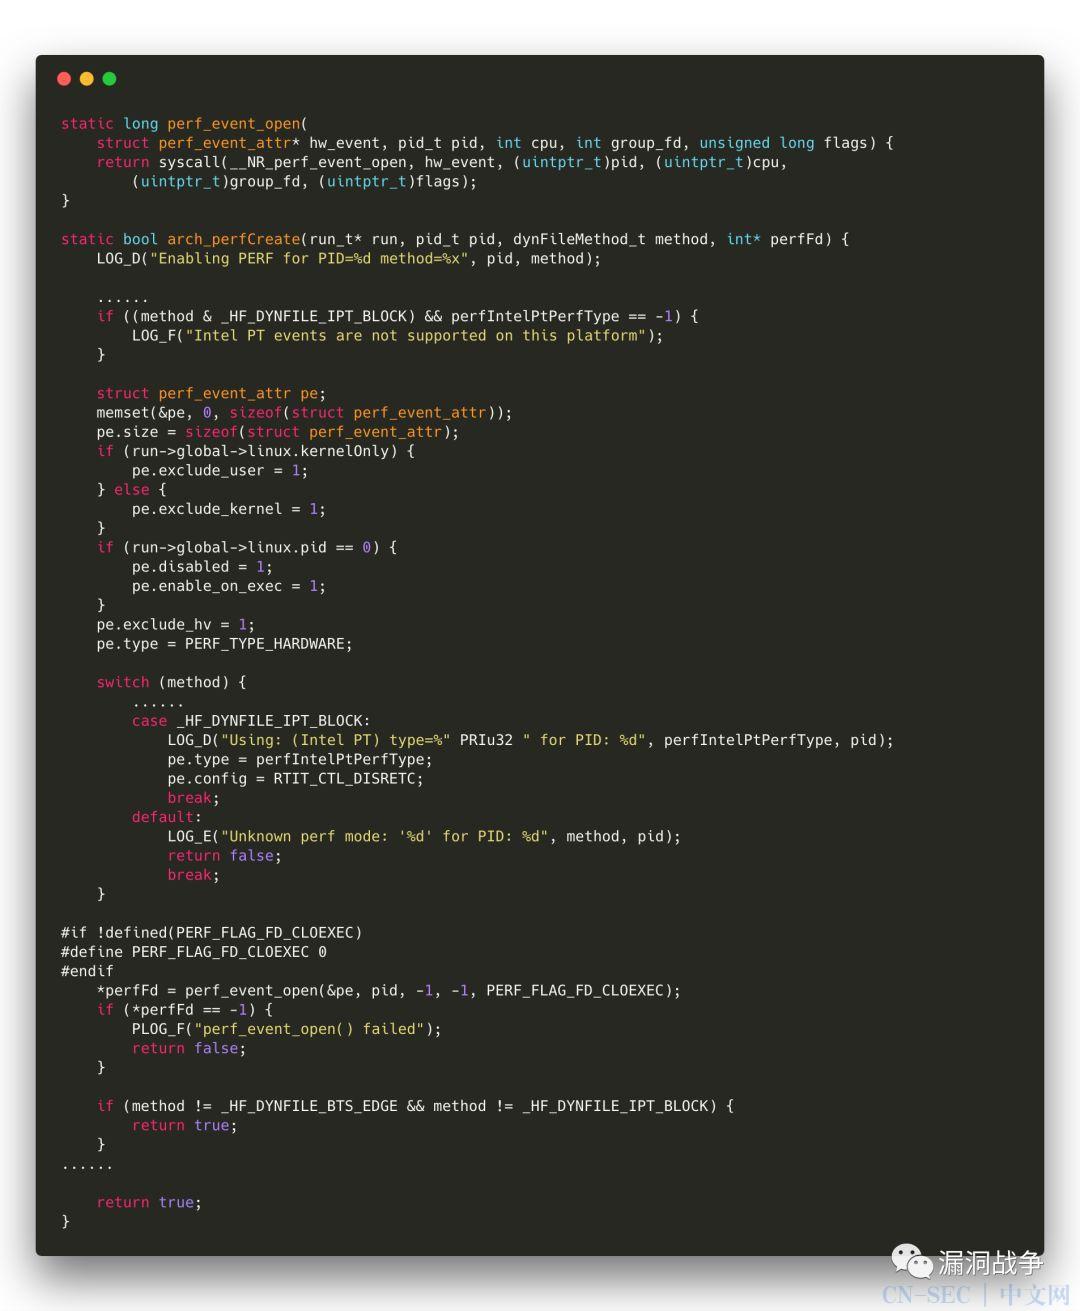 honggfuzz漏洞挖掘技术深究系列(5)—— Intel Processor Trace